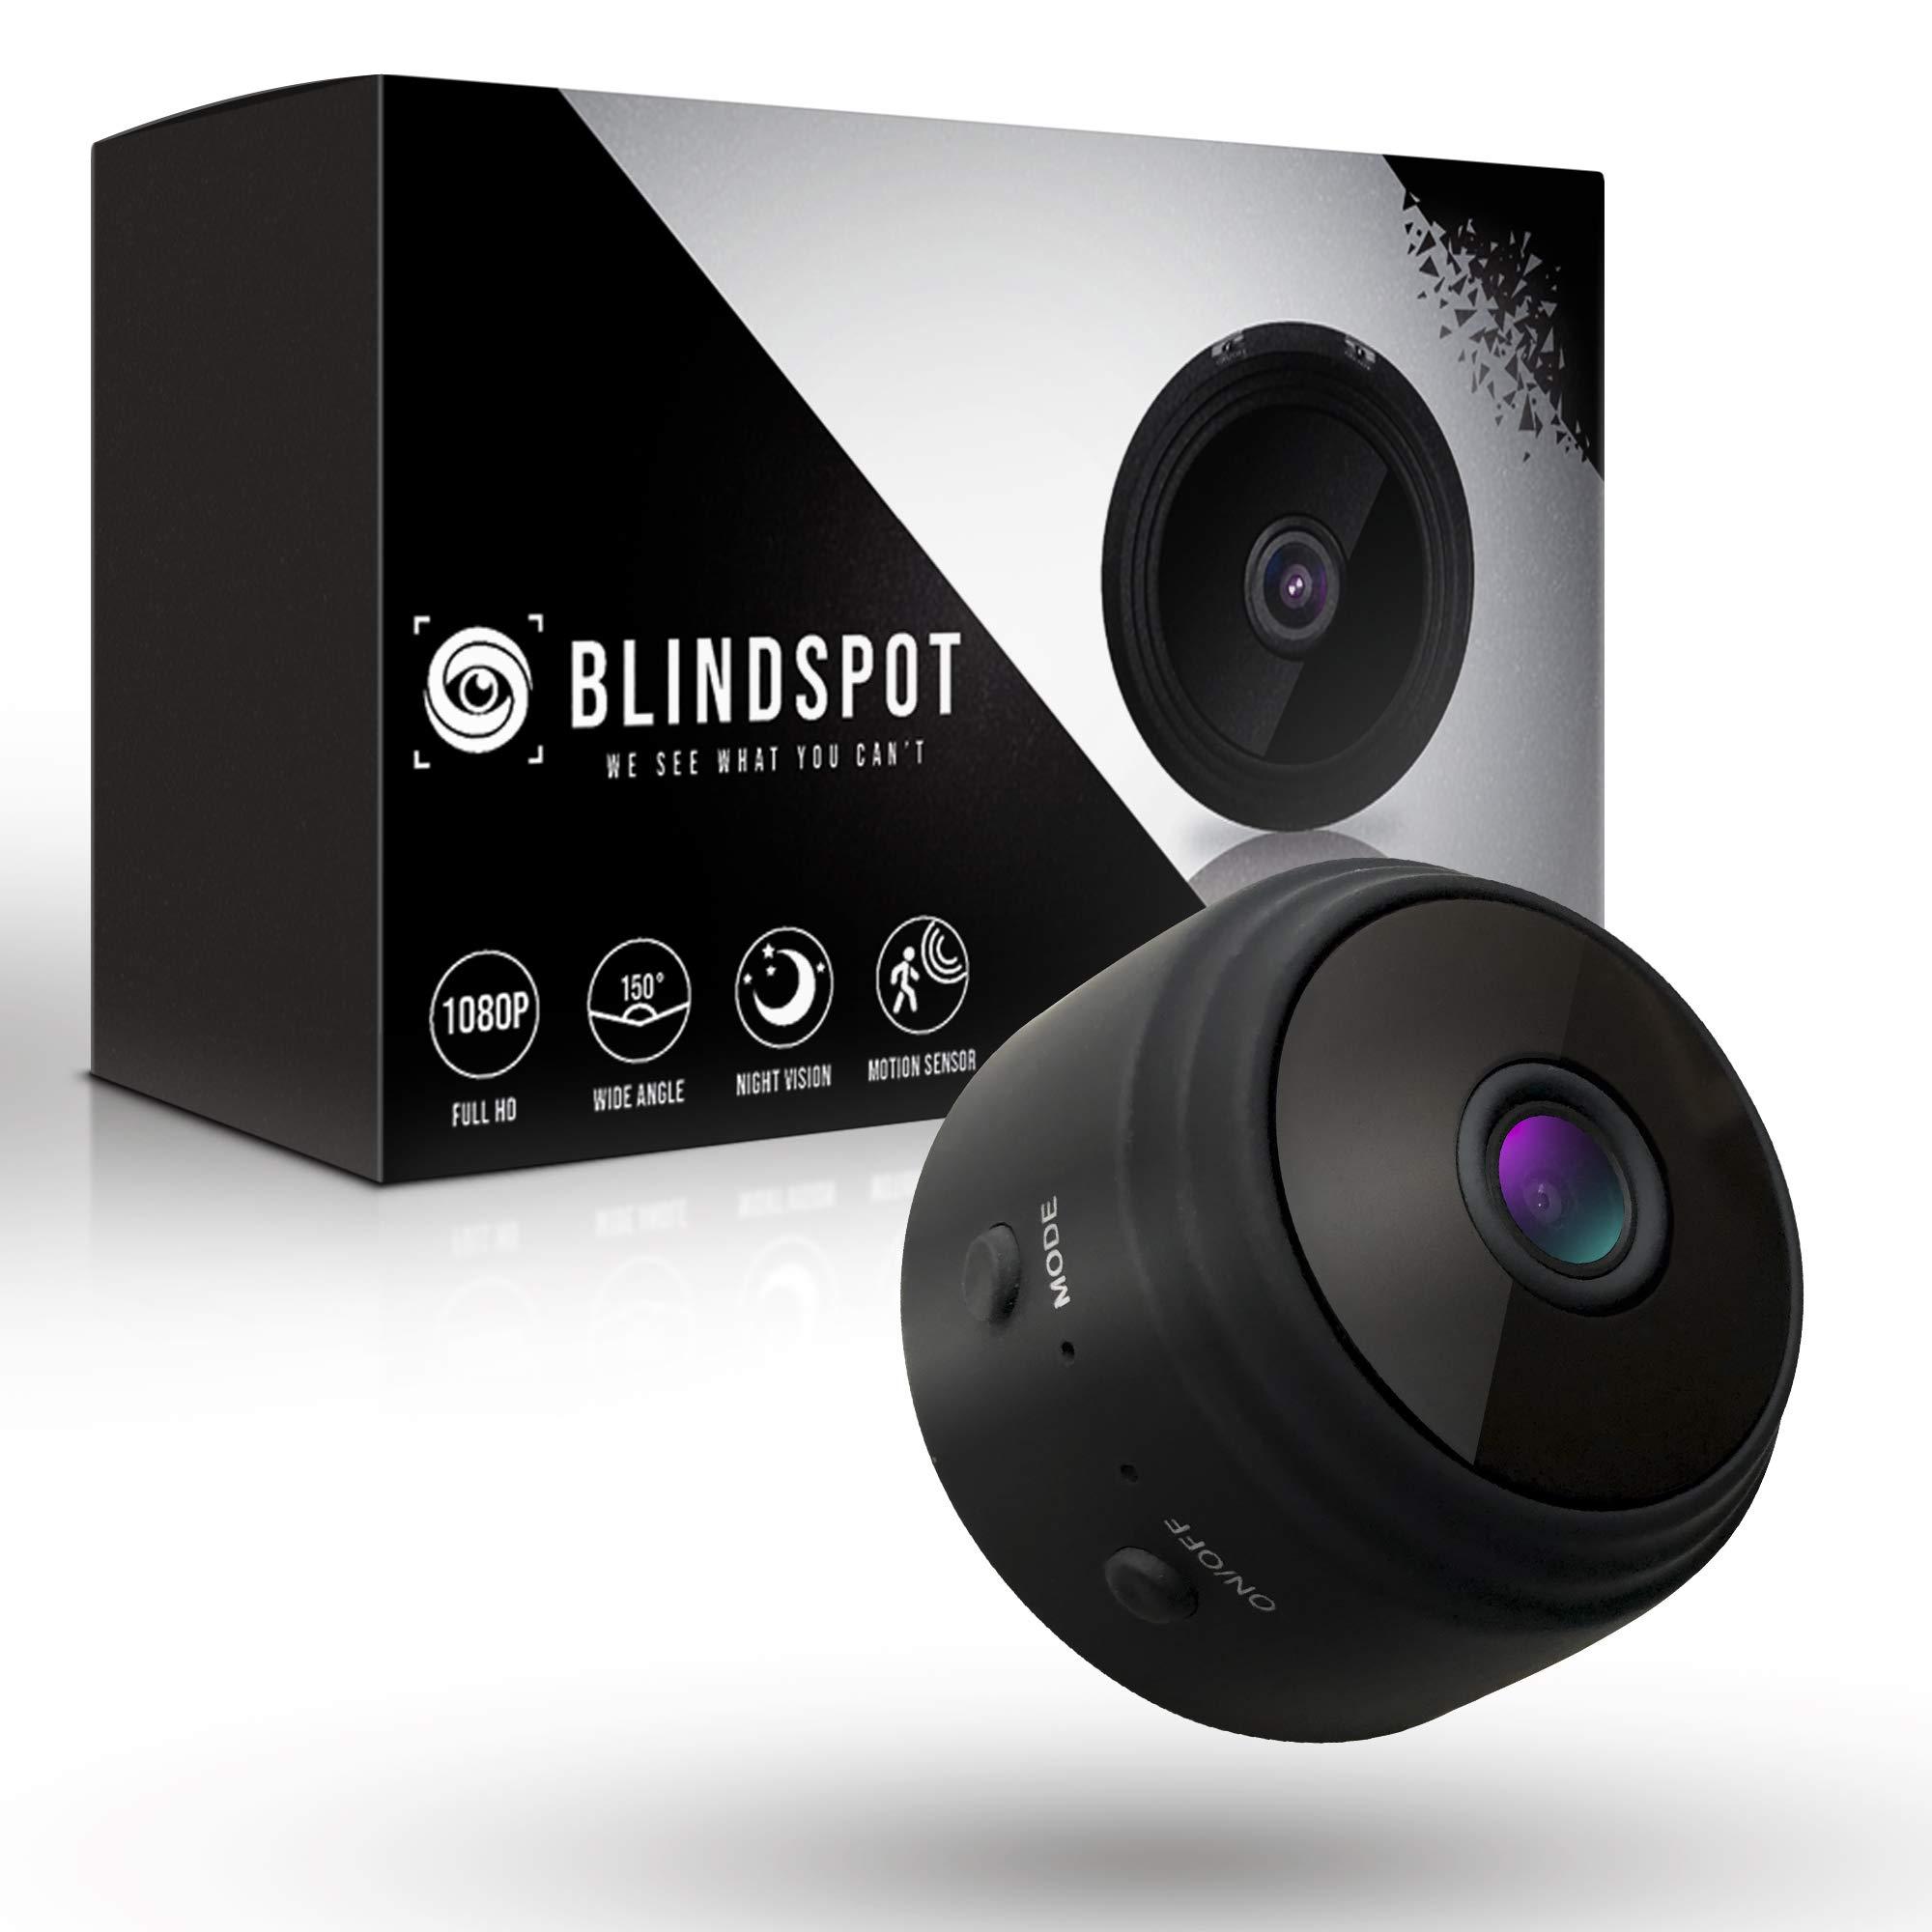 BLINDSPOT Spy Camera Wireless Hidden Home Protection Mini Camera | Portable Security Hidden Camera with 150° Lens, Motion Sensor, Night Vision & HD 1080p Recording WiFi Nanny Cam [2019 Upgraded Model] by Blindspot